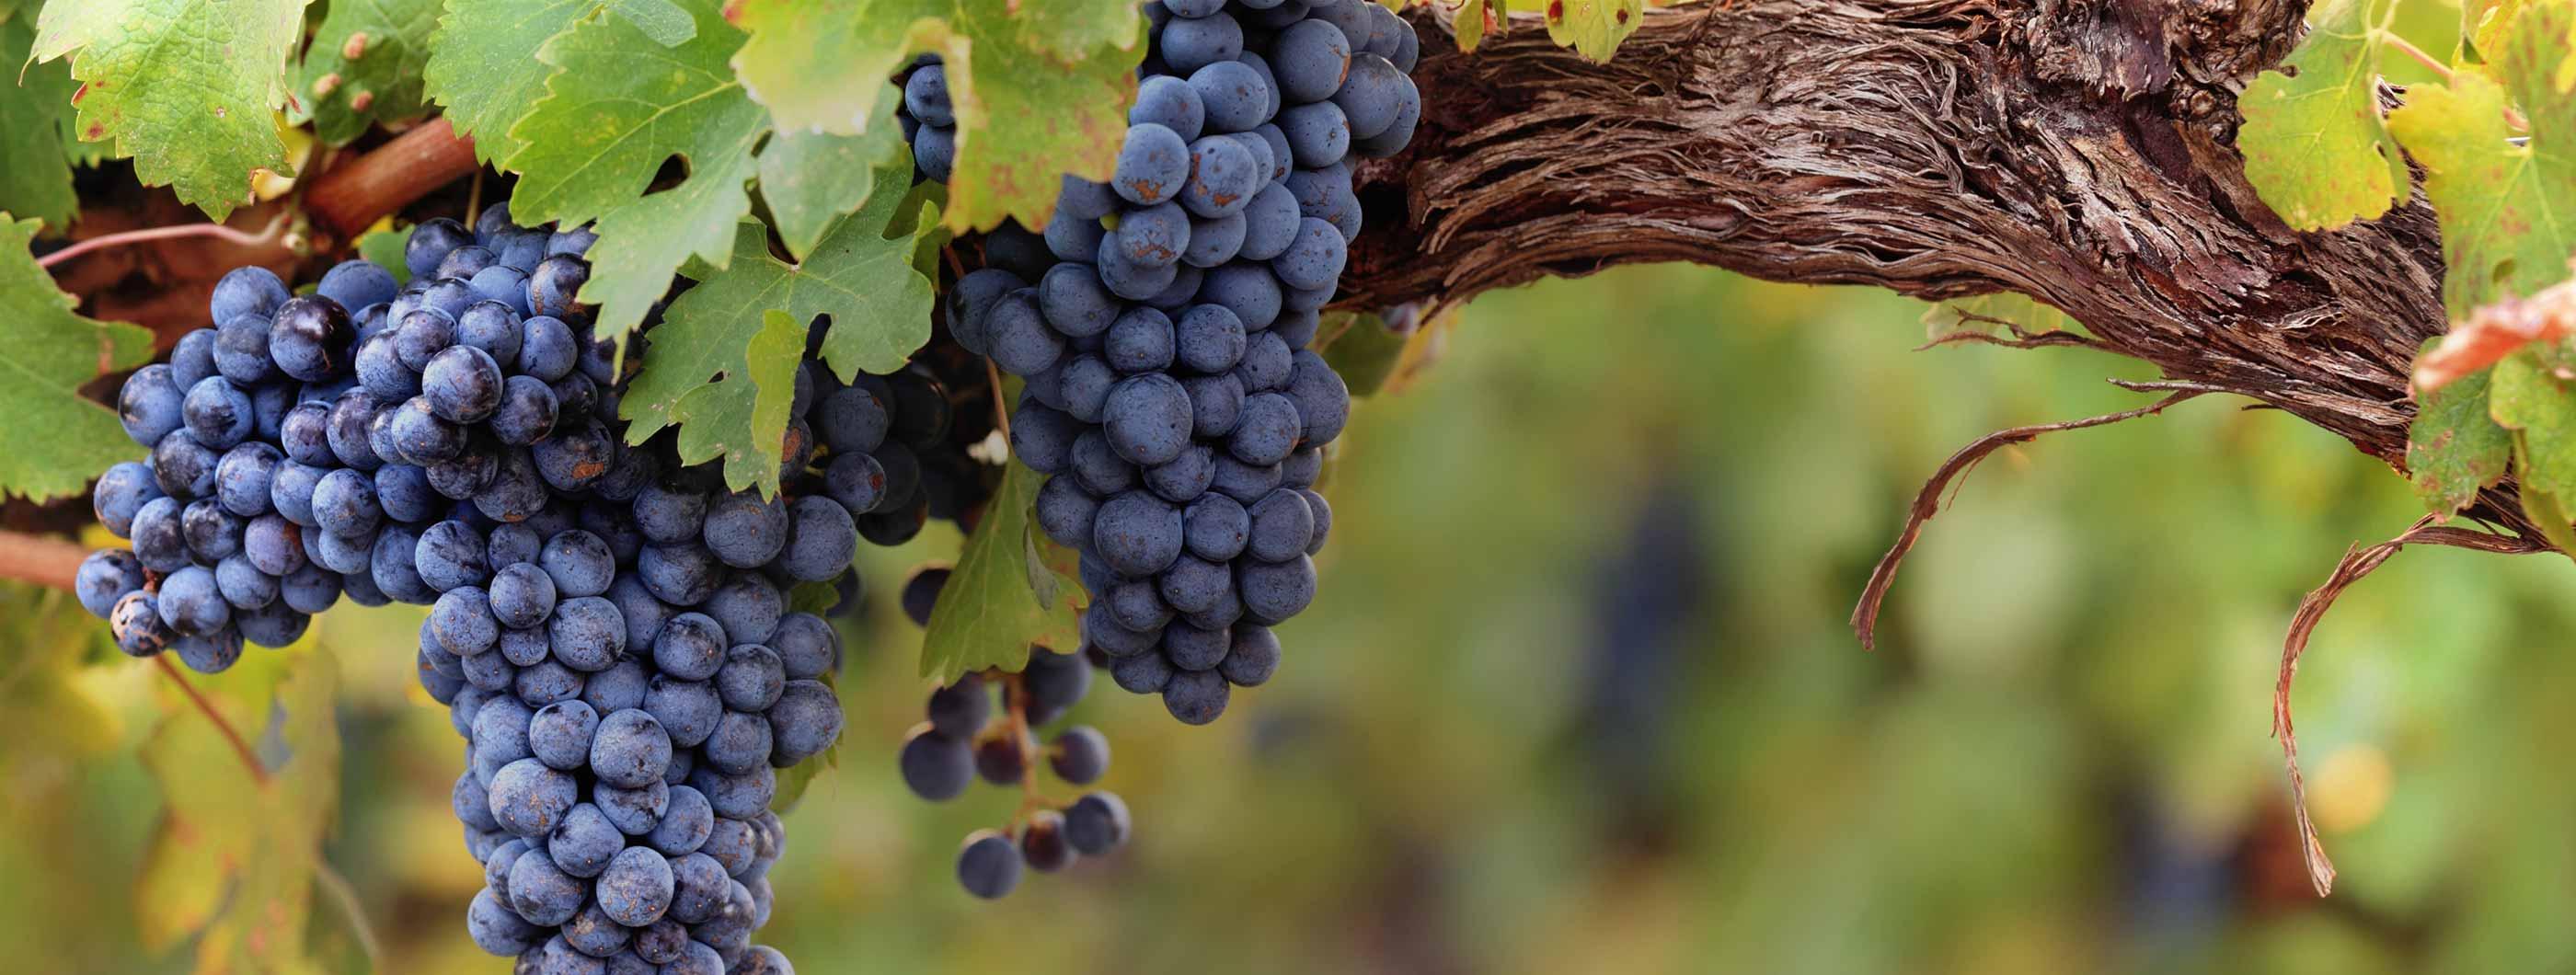 DWM - Quality Management Vineyards